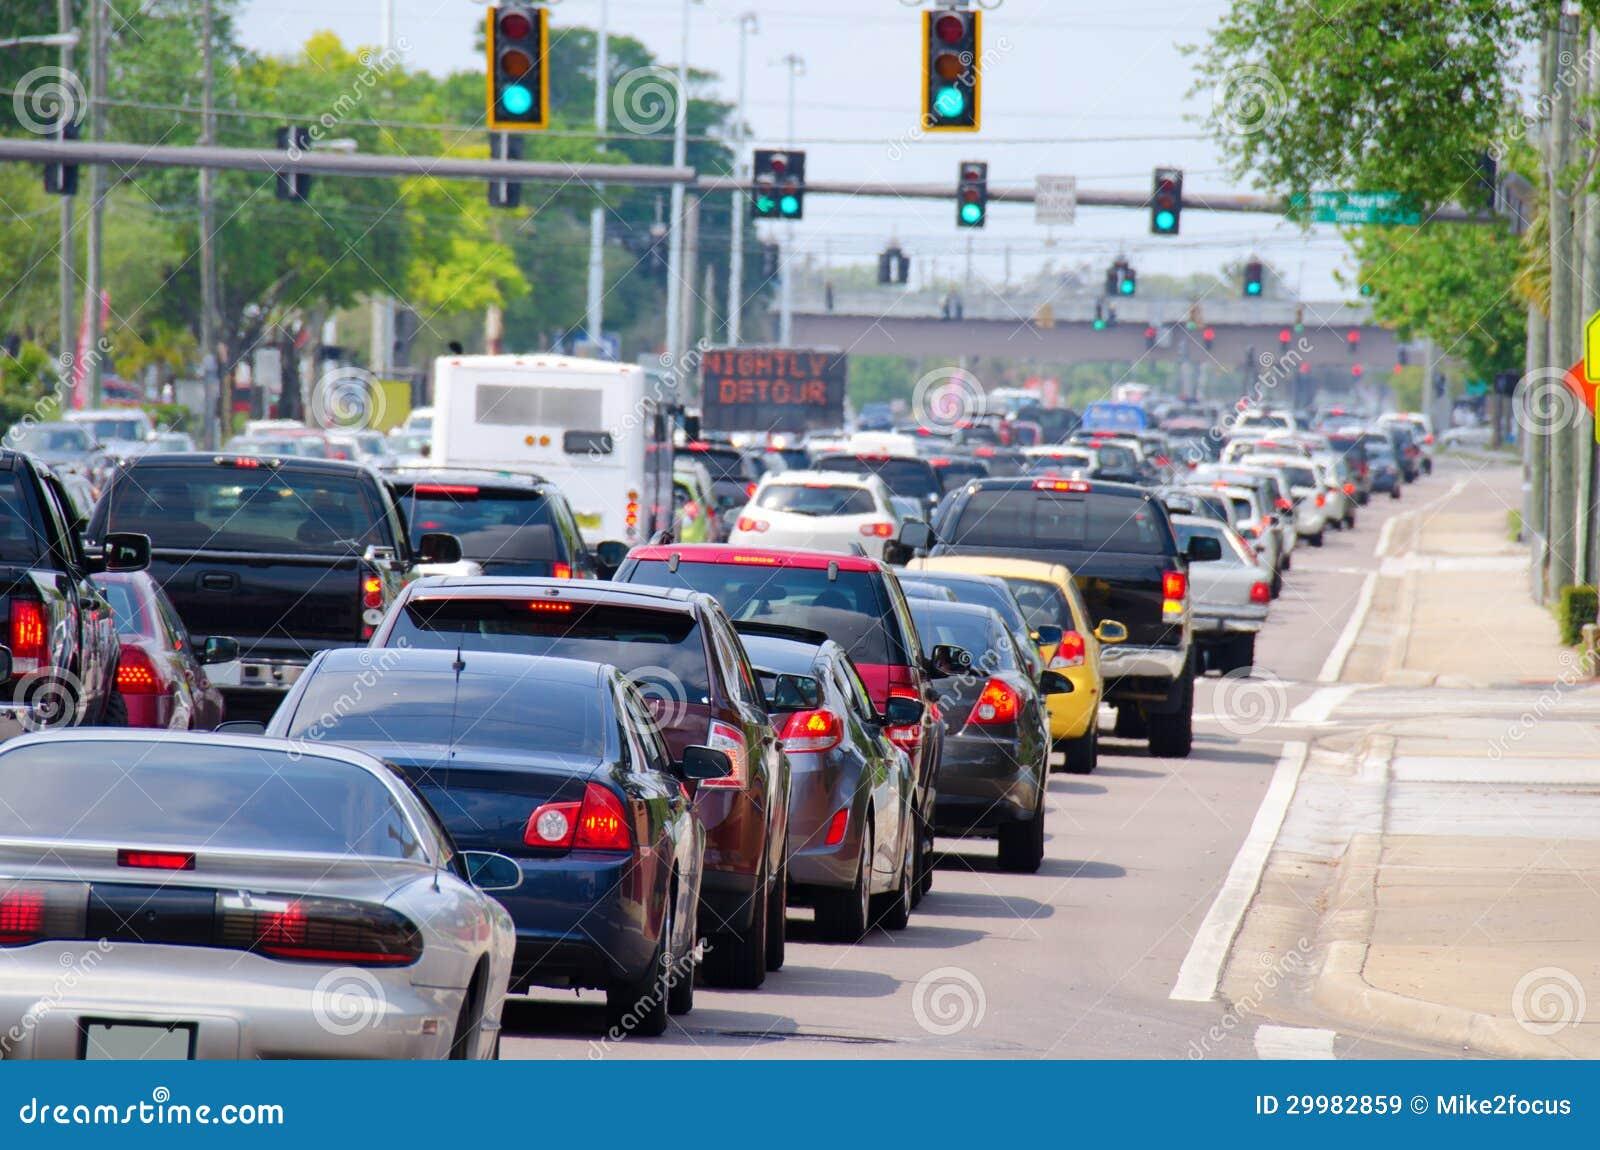 Traffic Lights With Rush Hour Traffic Jam Royalty Free